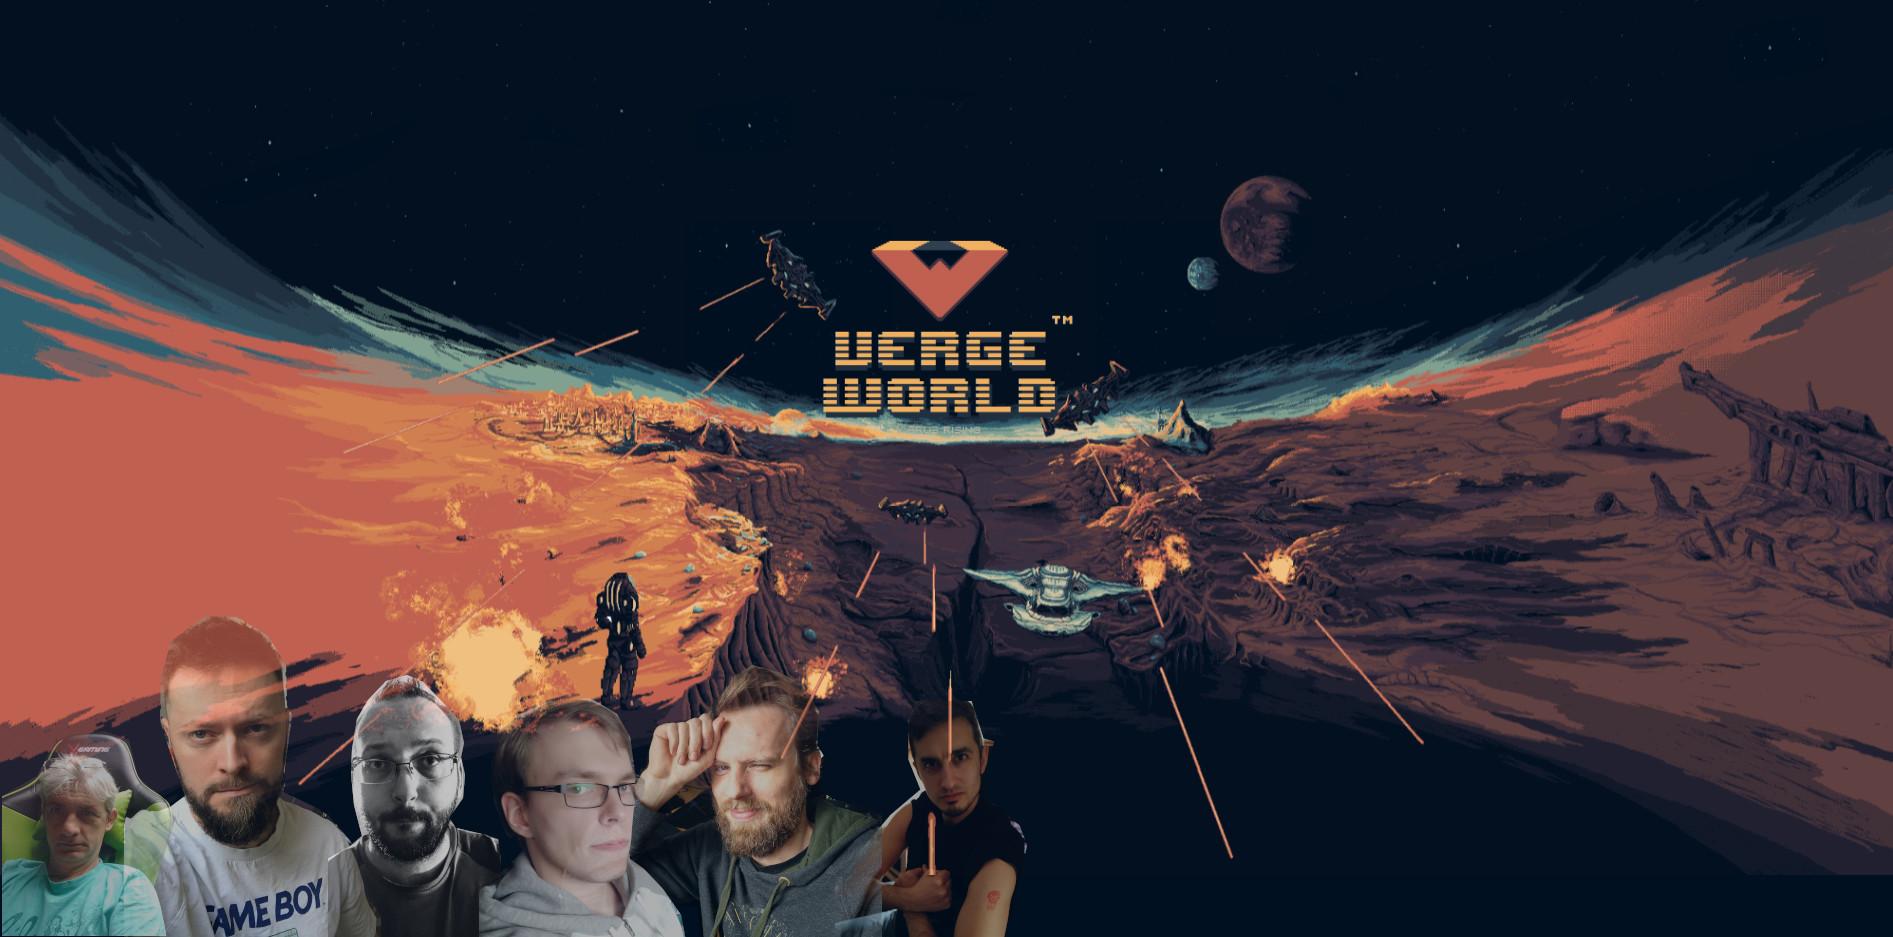 The complete Vergeworld team!